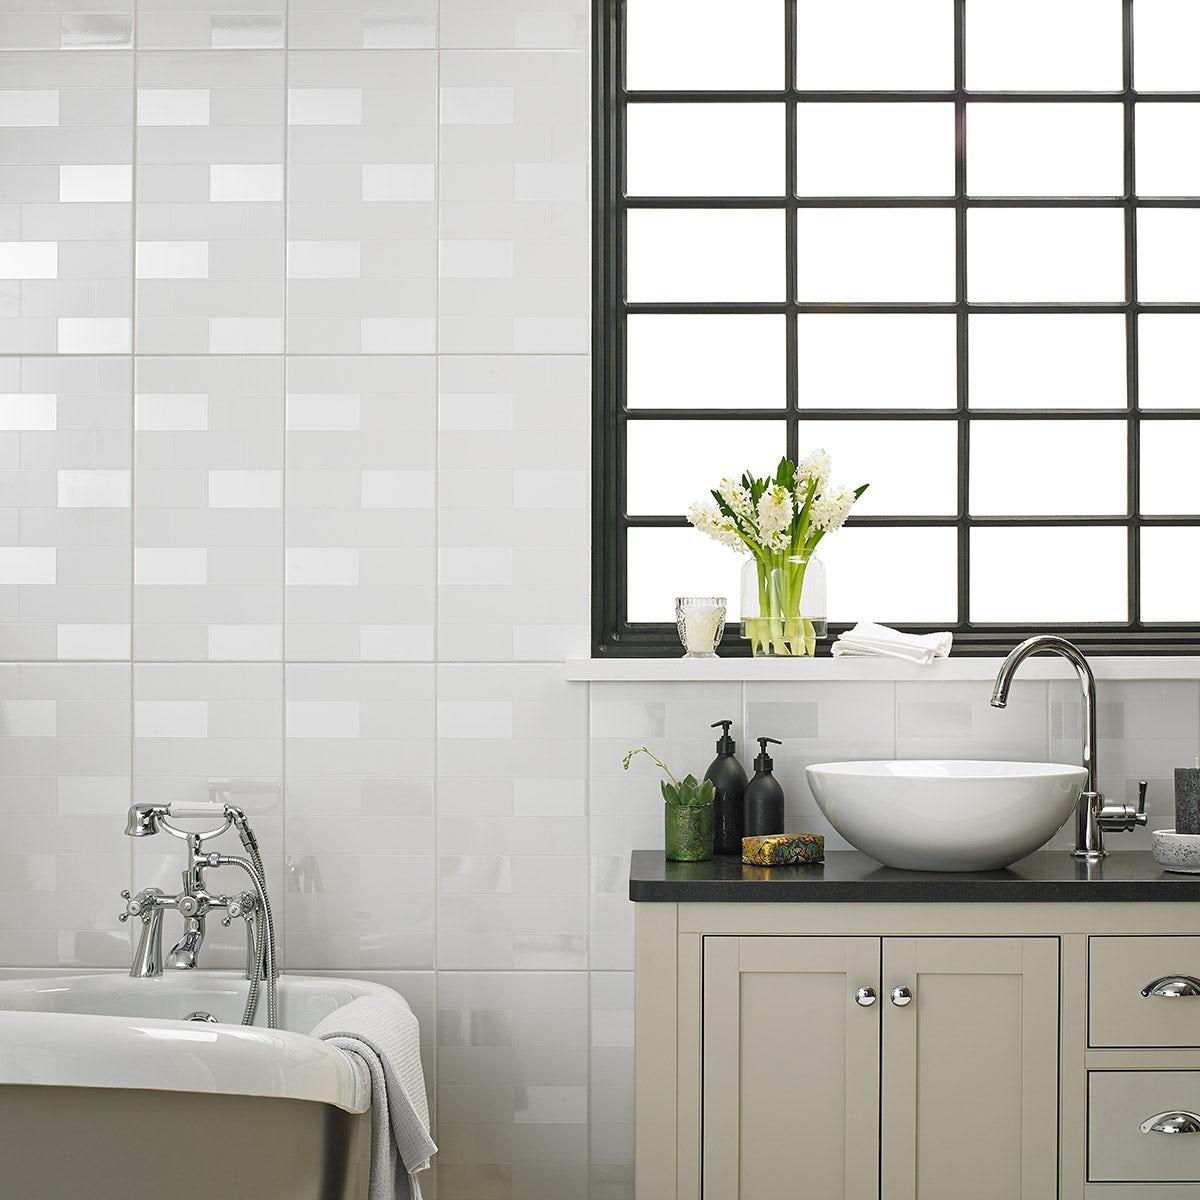 Laura ashley bathroom tiles - New Laura Ashley Highgate Gloss White Wall Tile 248mm X 498mm